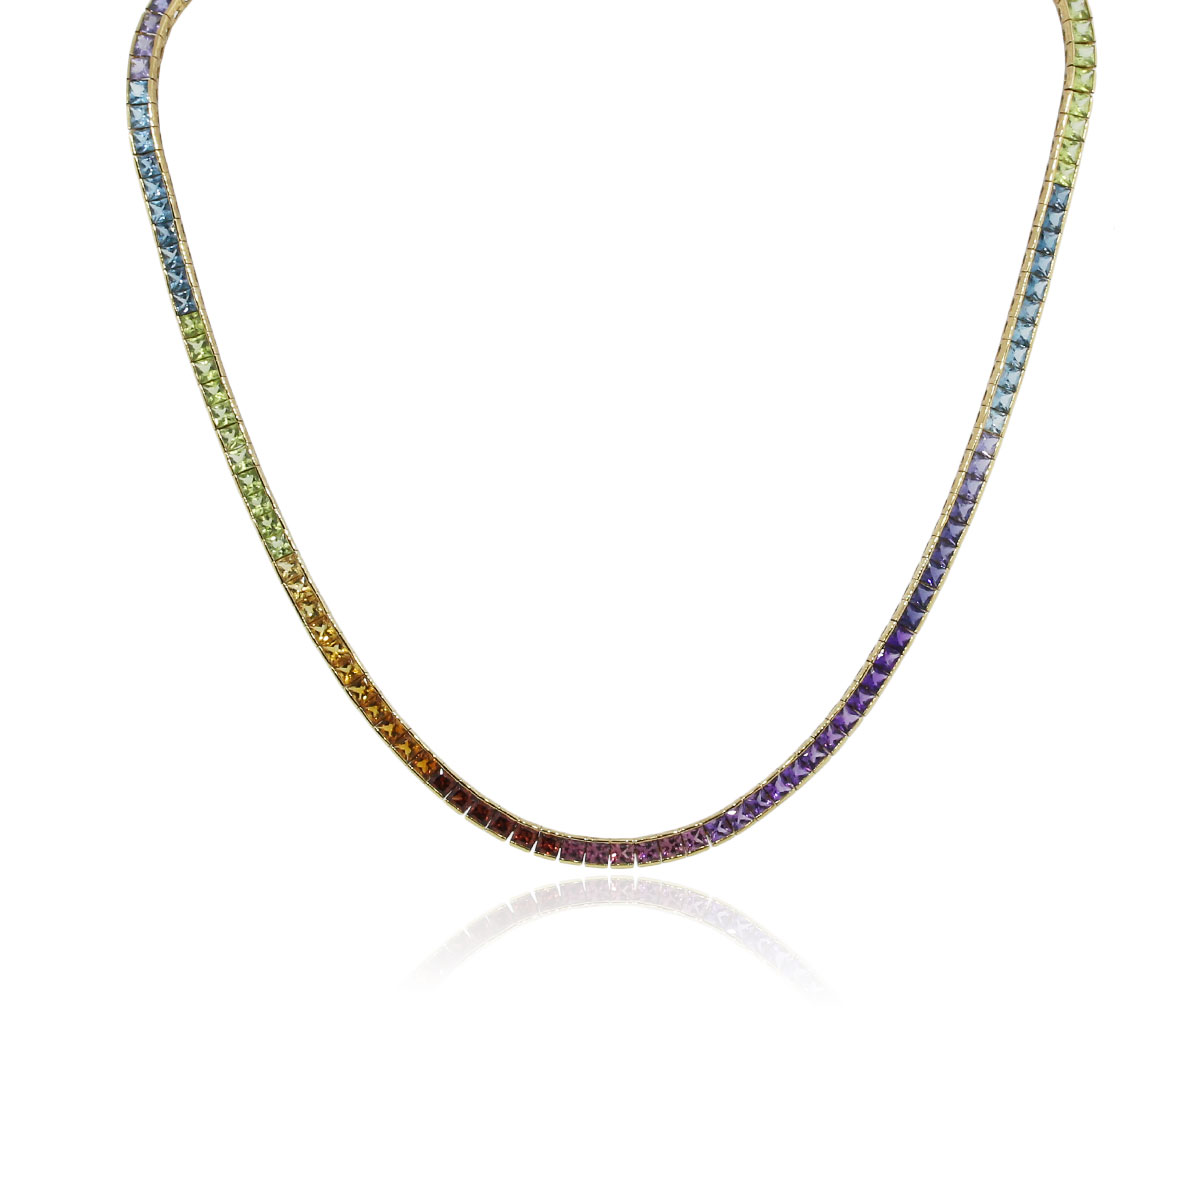 H Stern 18k Yellow Gold Multi Gemstone Rainbow Necklace